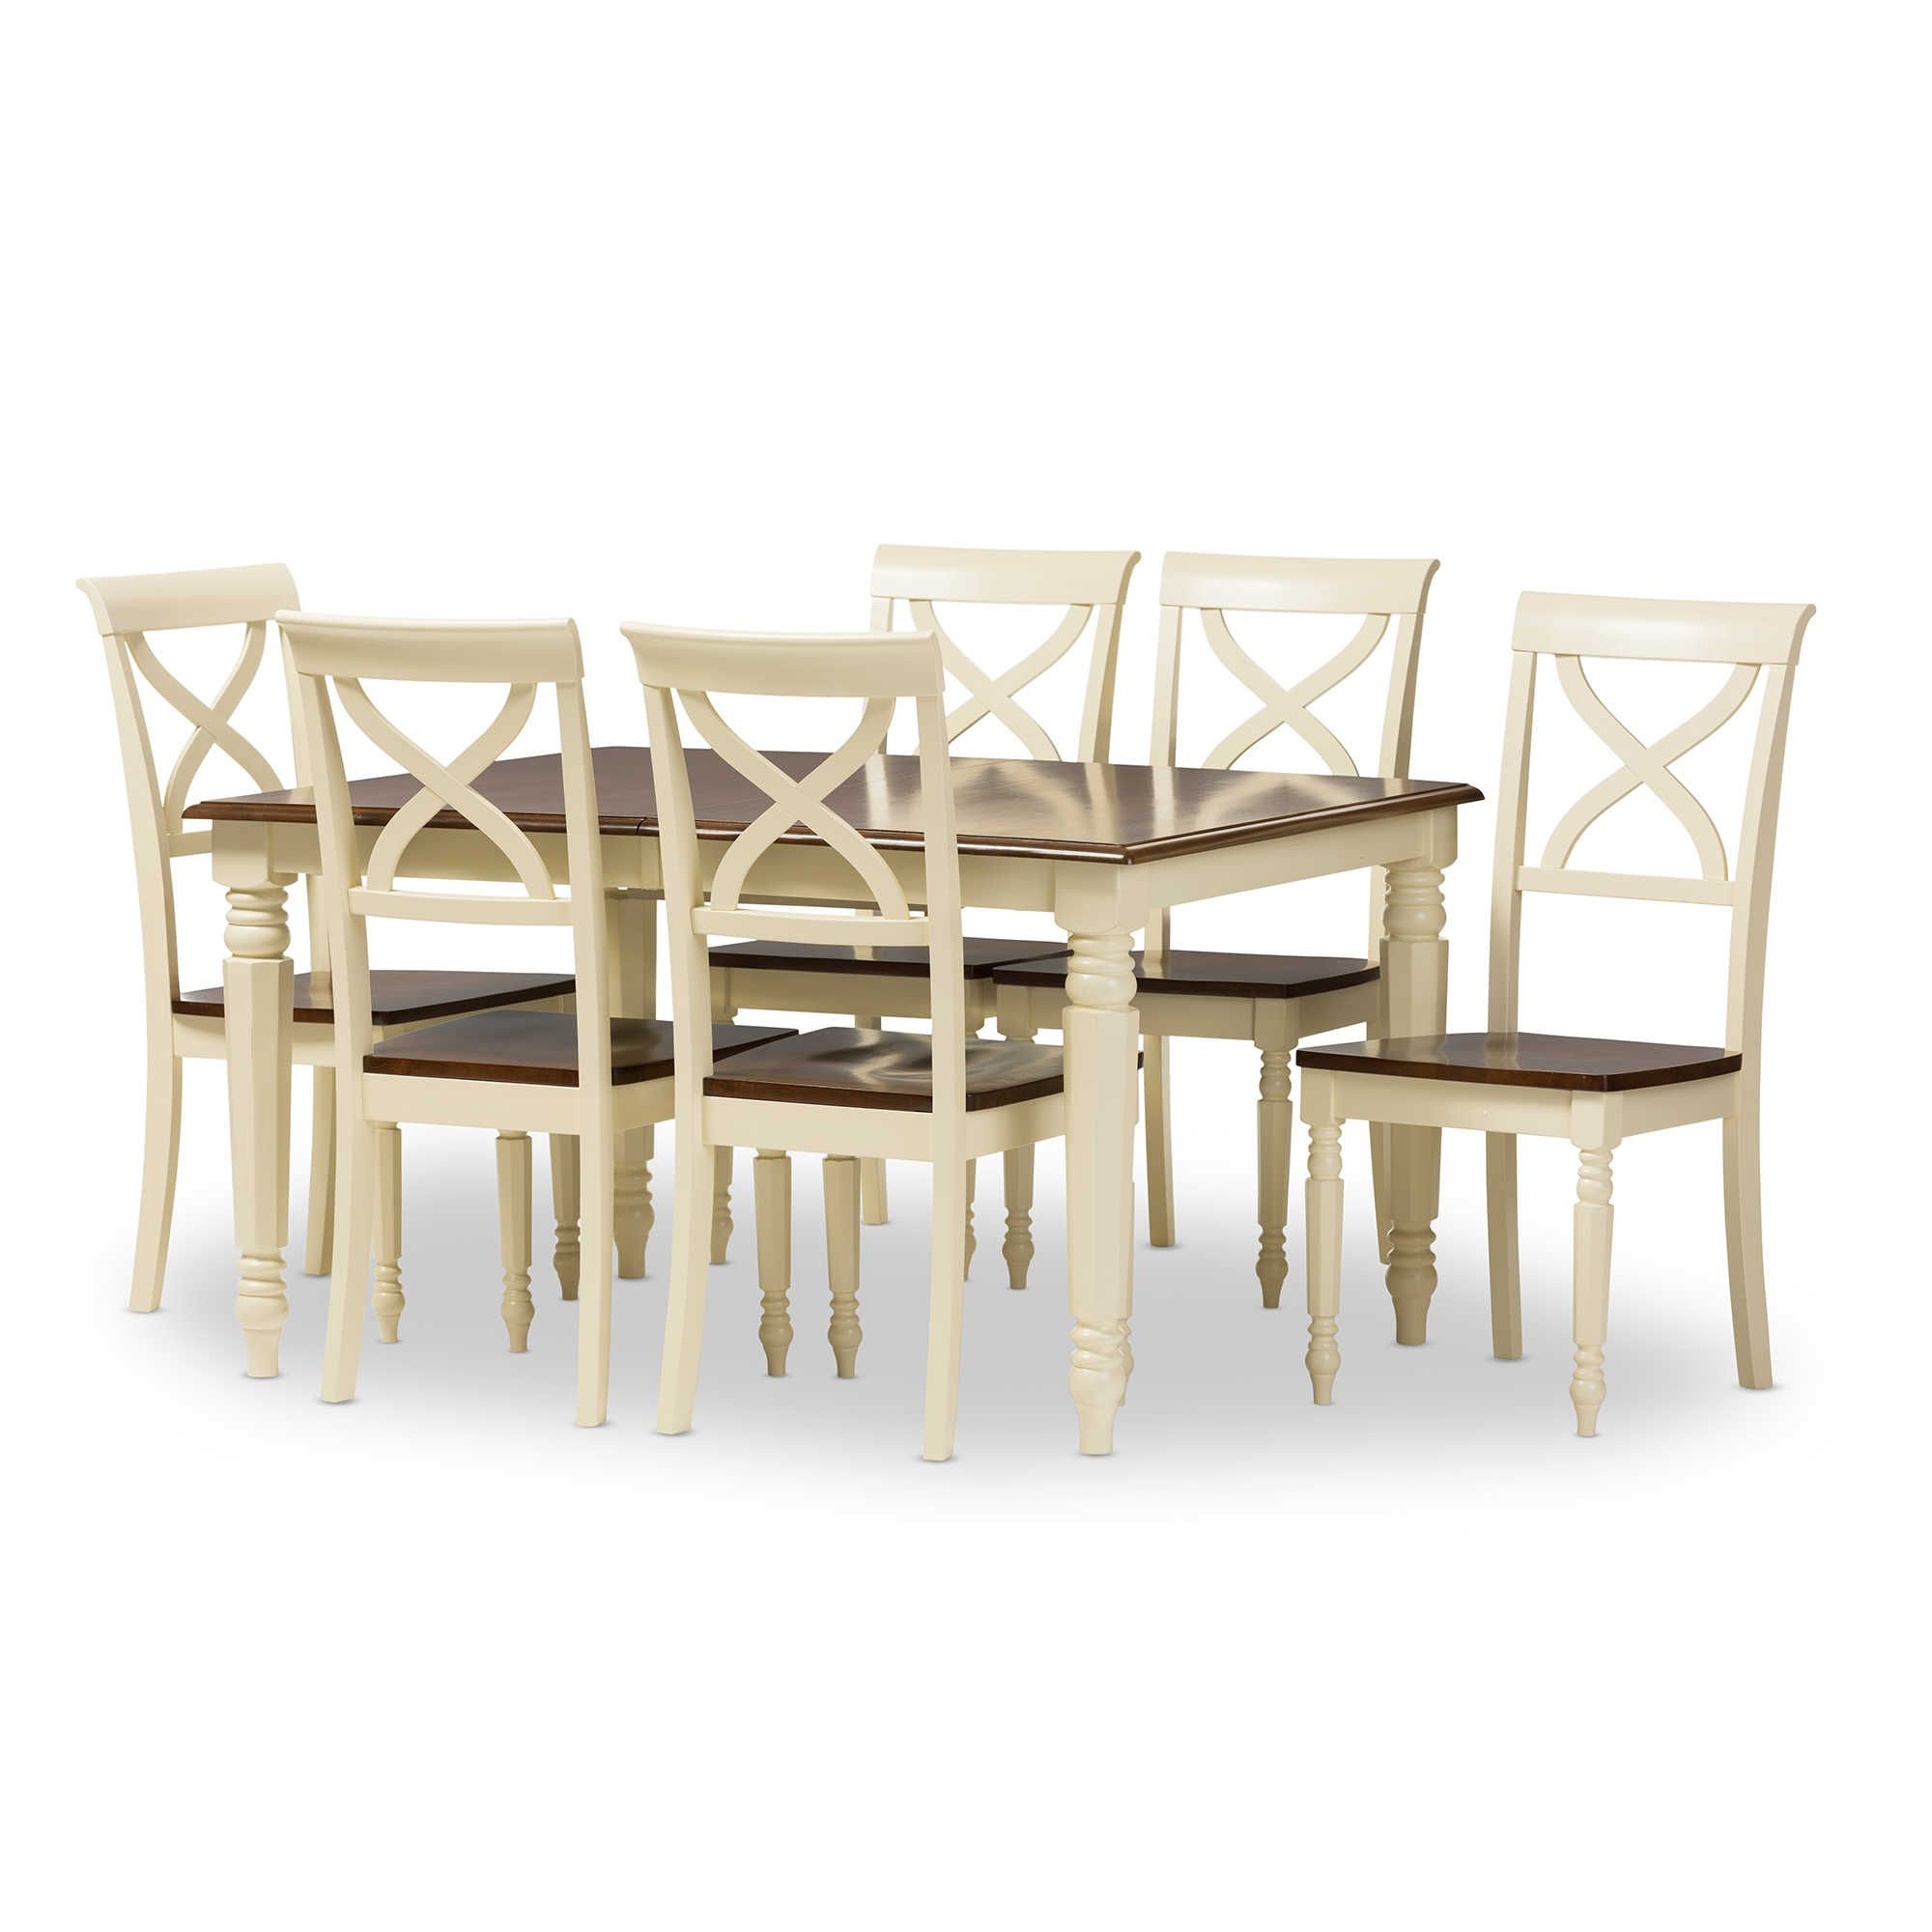 Ashton Dining Collection in Brown Cream. Ashton Dining Collection in Brown Cream   Home   furniture   Pinterest